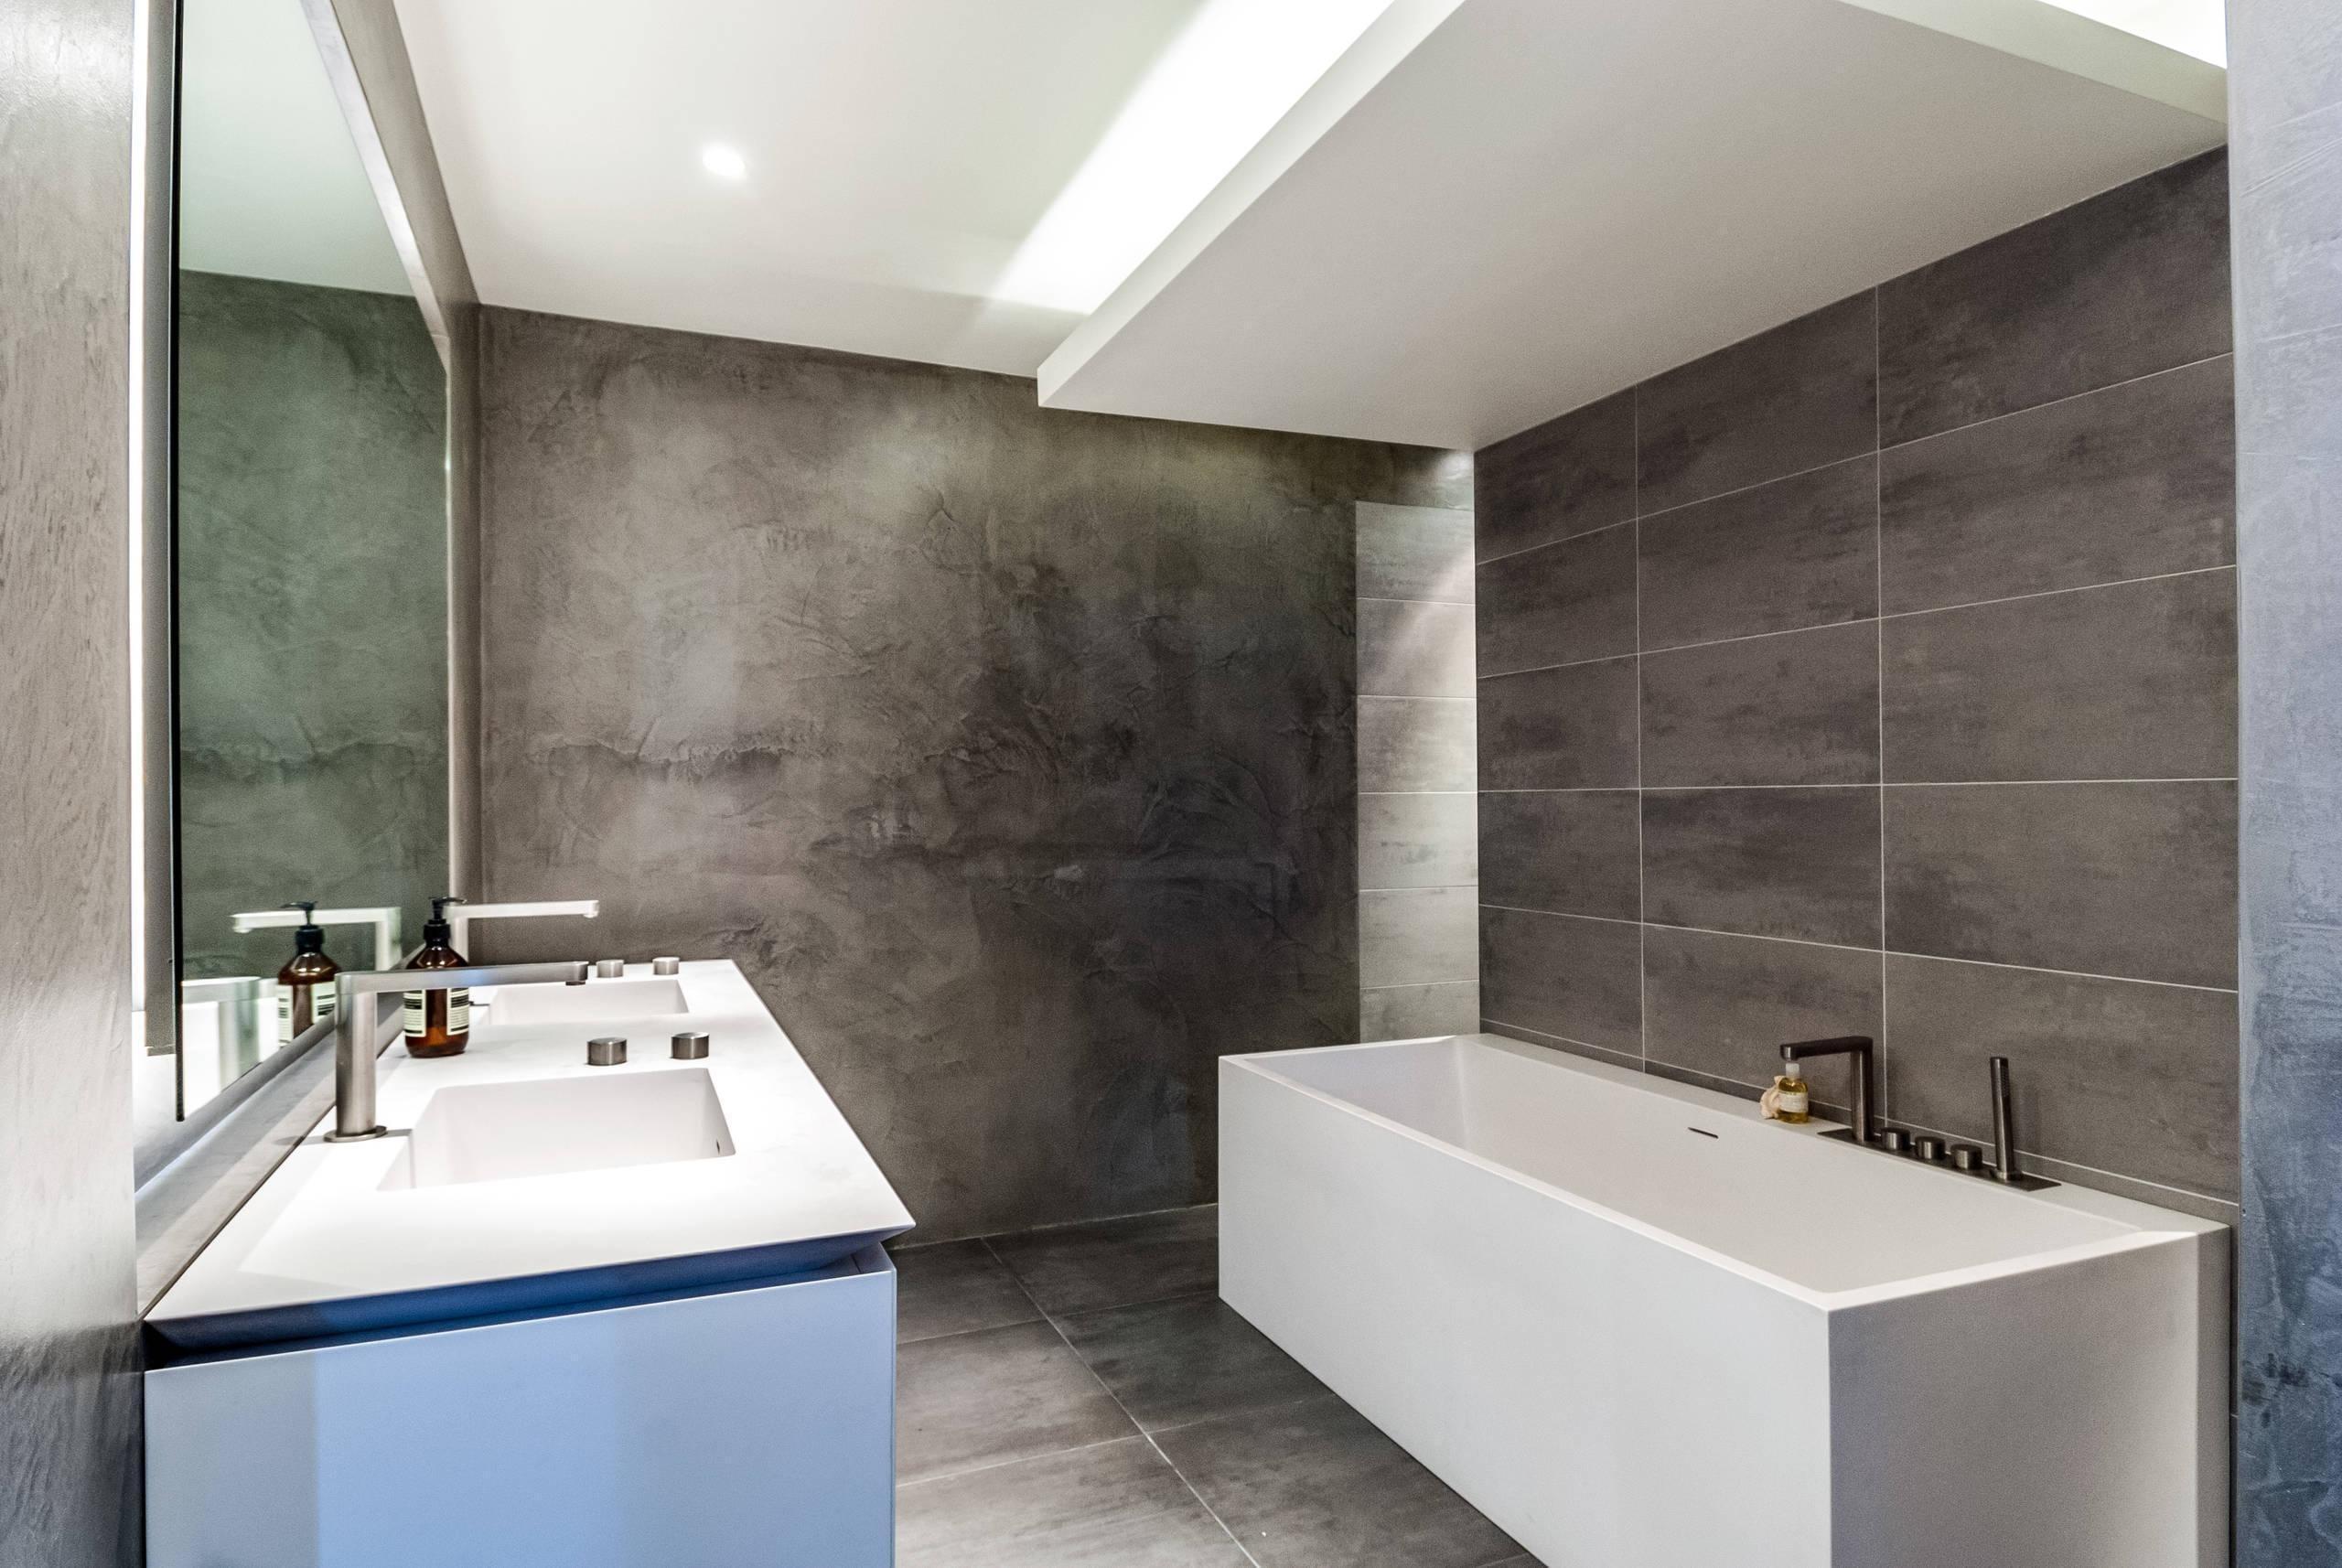 "Foto: Reprodução / <a href=""http://www.modernhomesolutions.co.uk/"" target=""_blank"">Modern Home Solutions</a>"